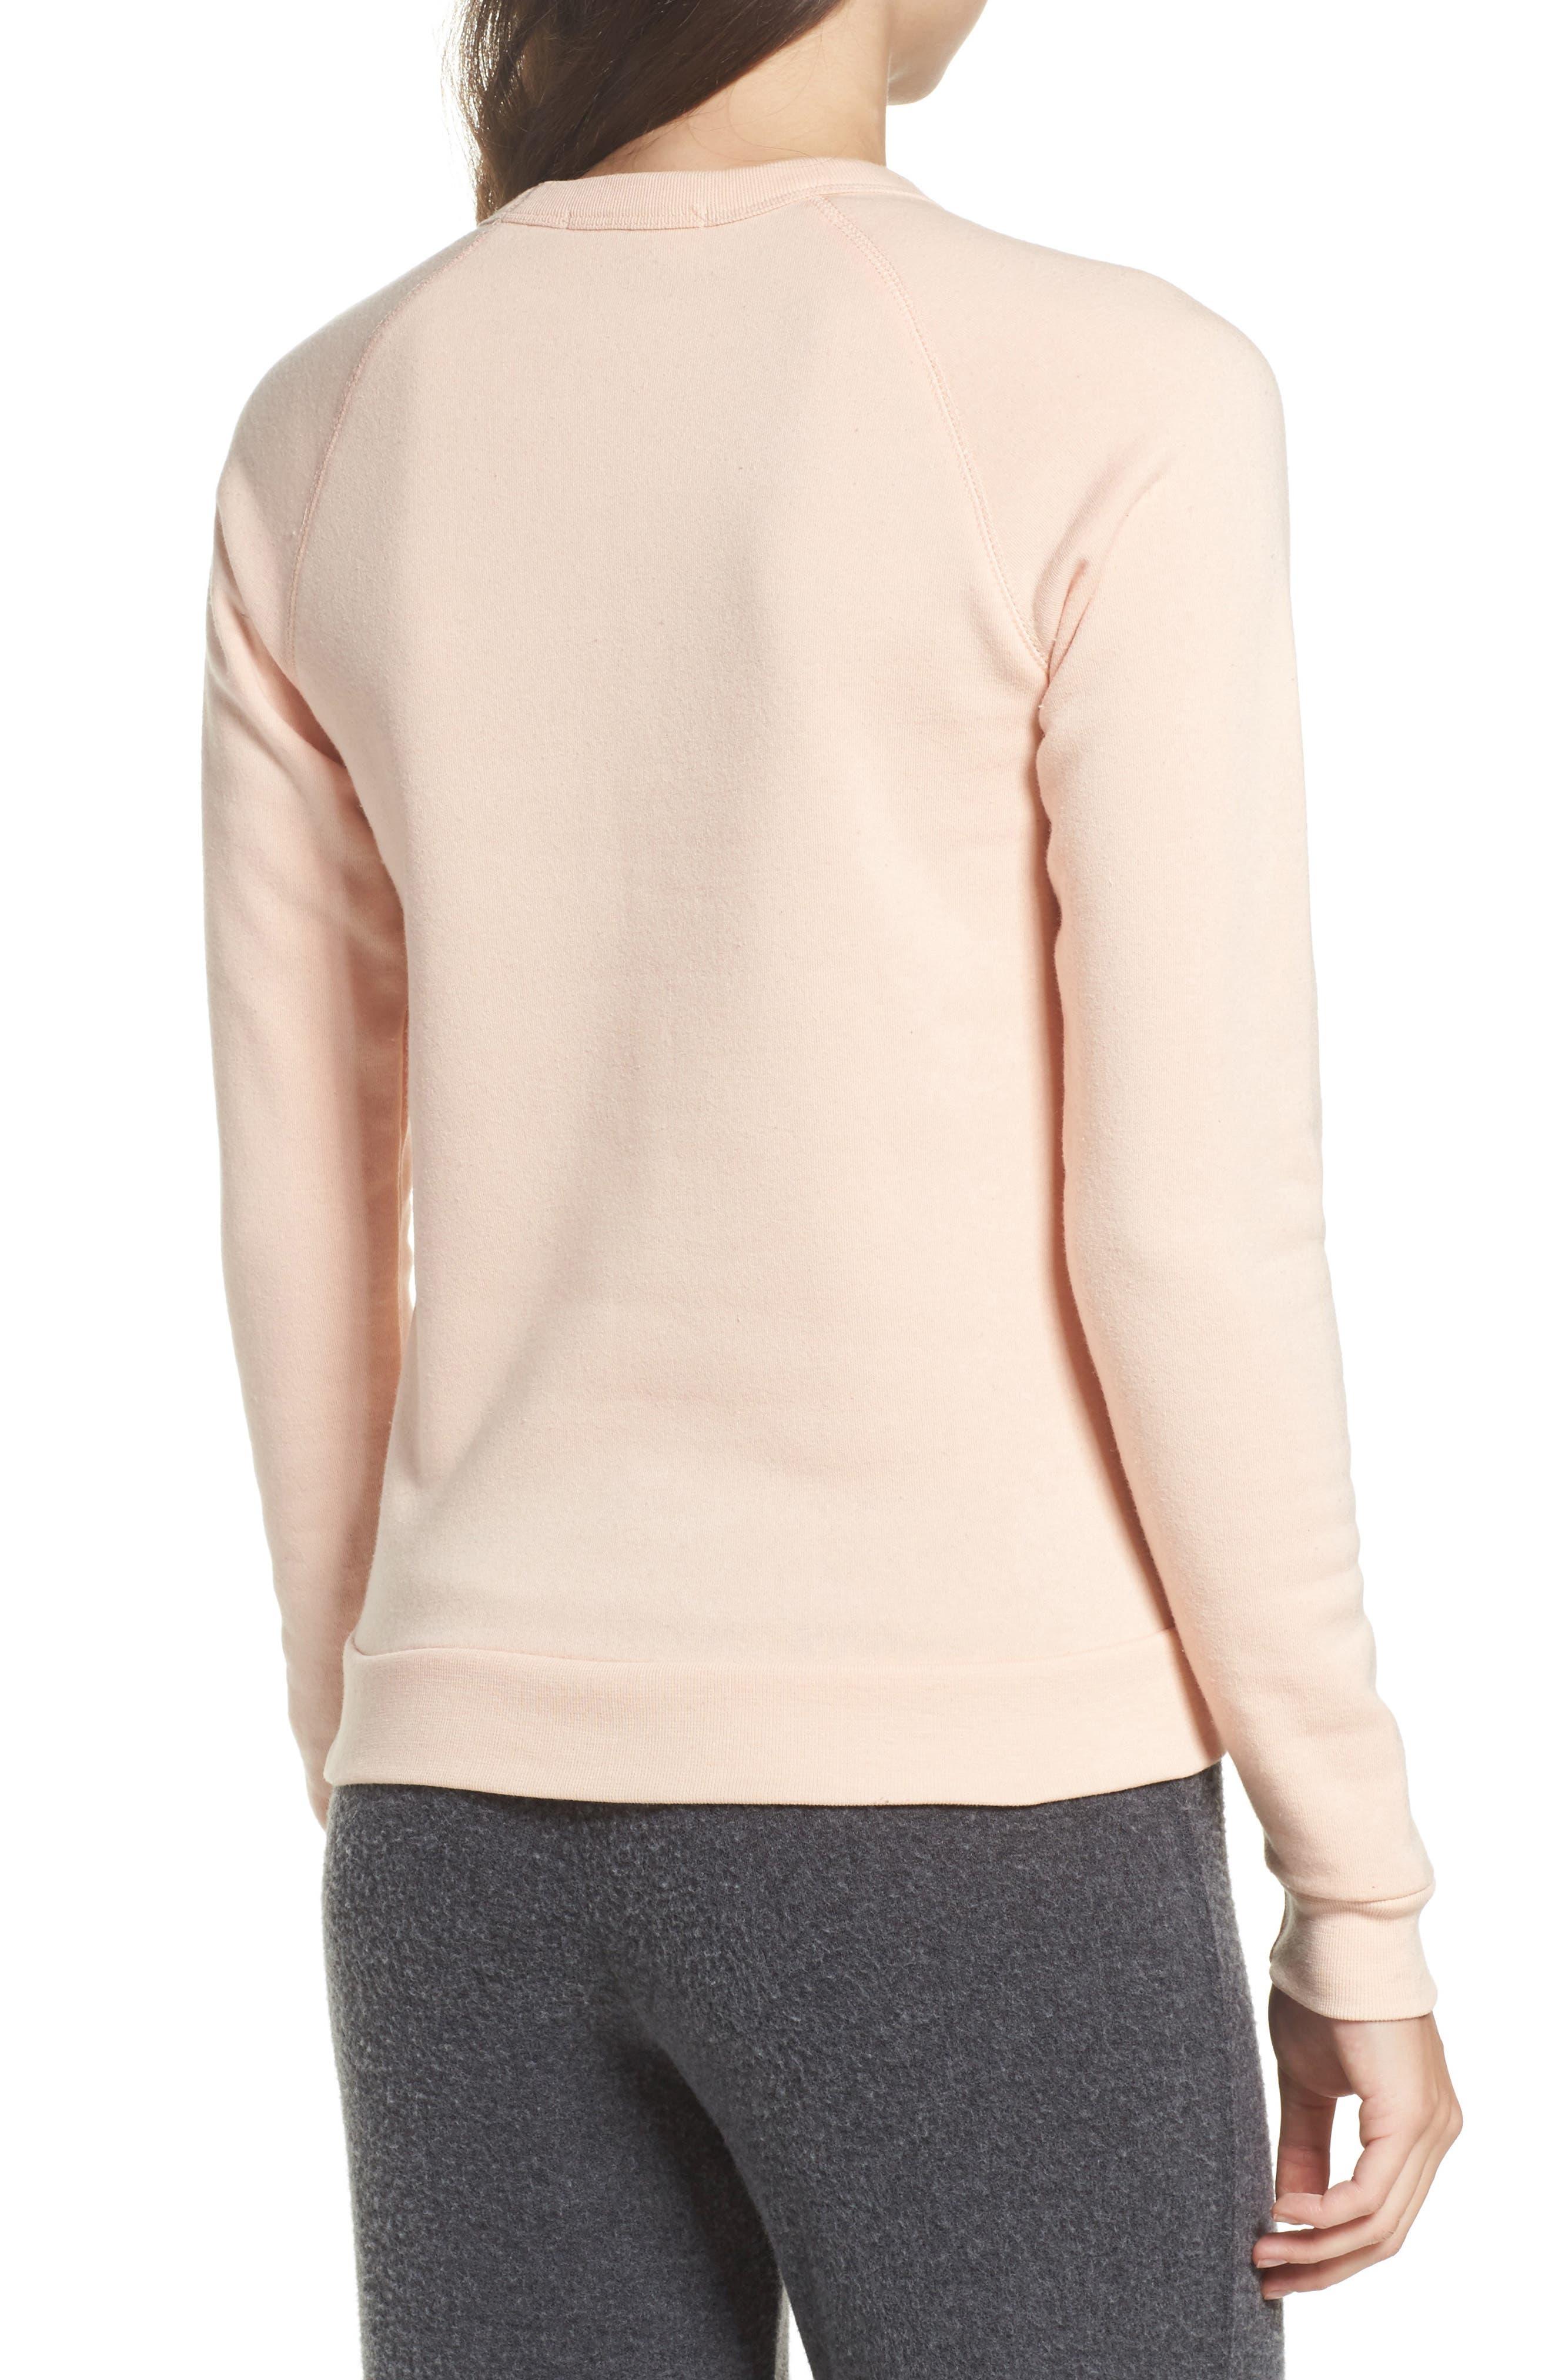 Alternate Image 2  - Bow & Drape Ready in a Prosecco Sweatshirt